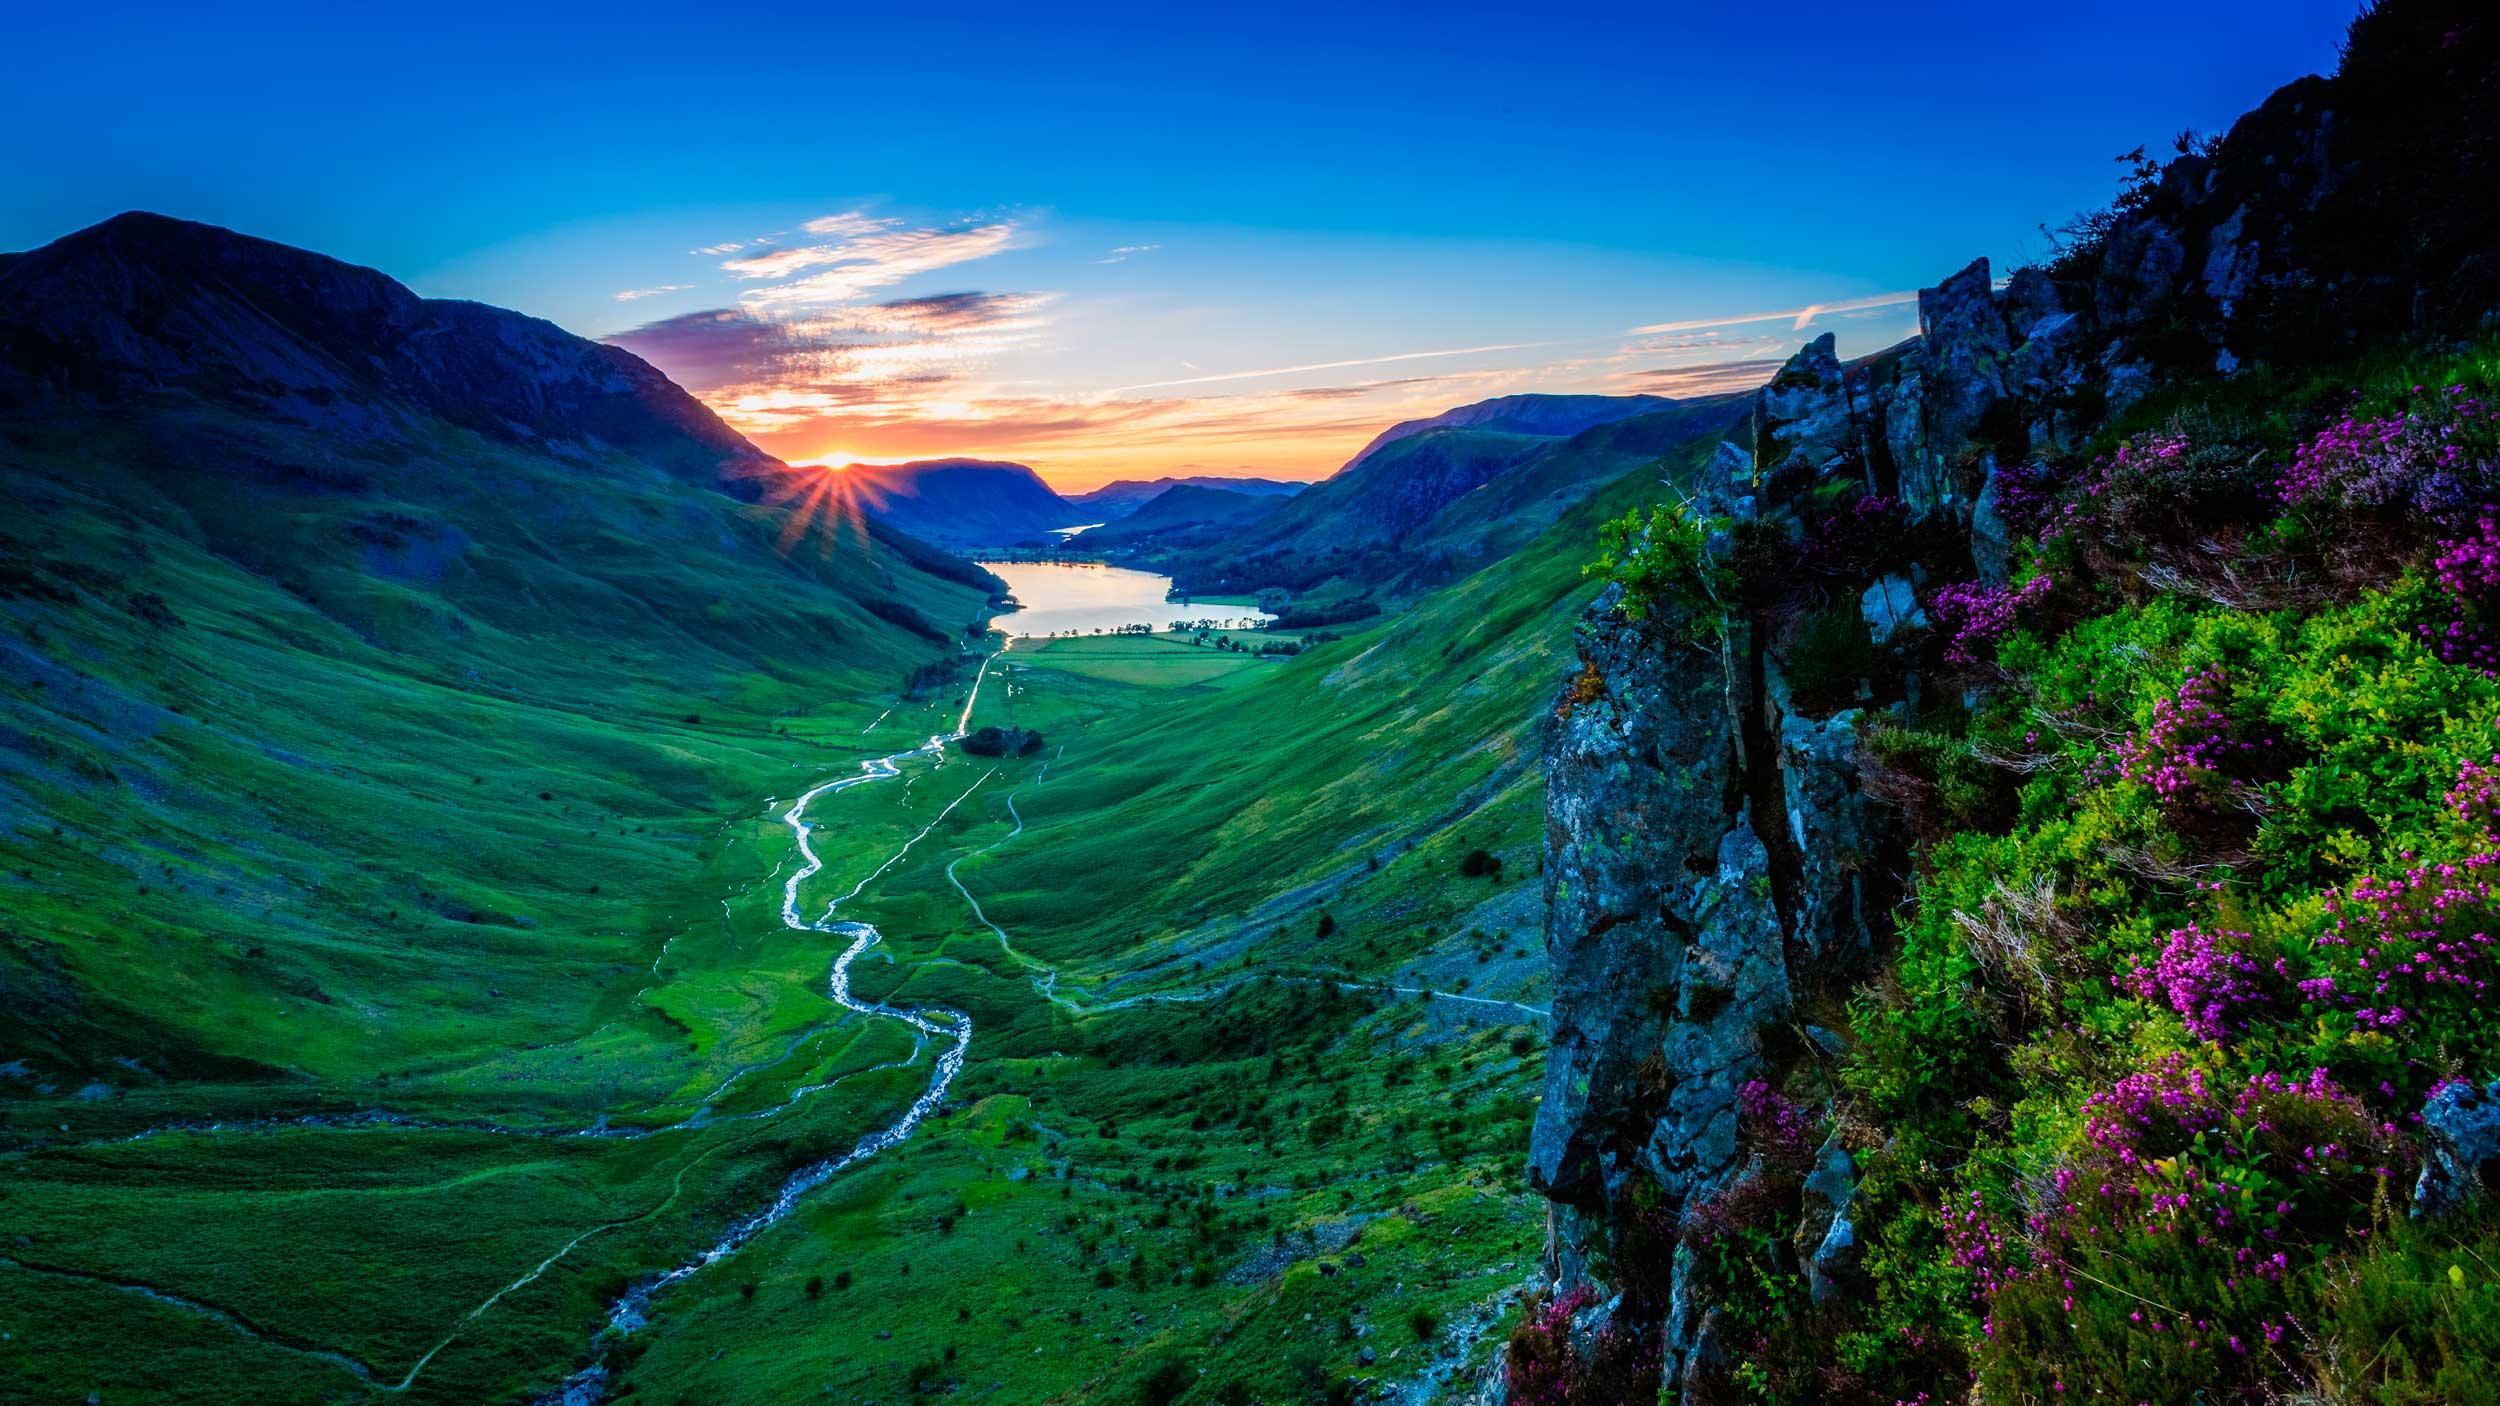 A fine Buttermere sunset, Lake District, England  (Michael Conrad/Shutterstock)